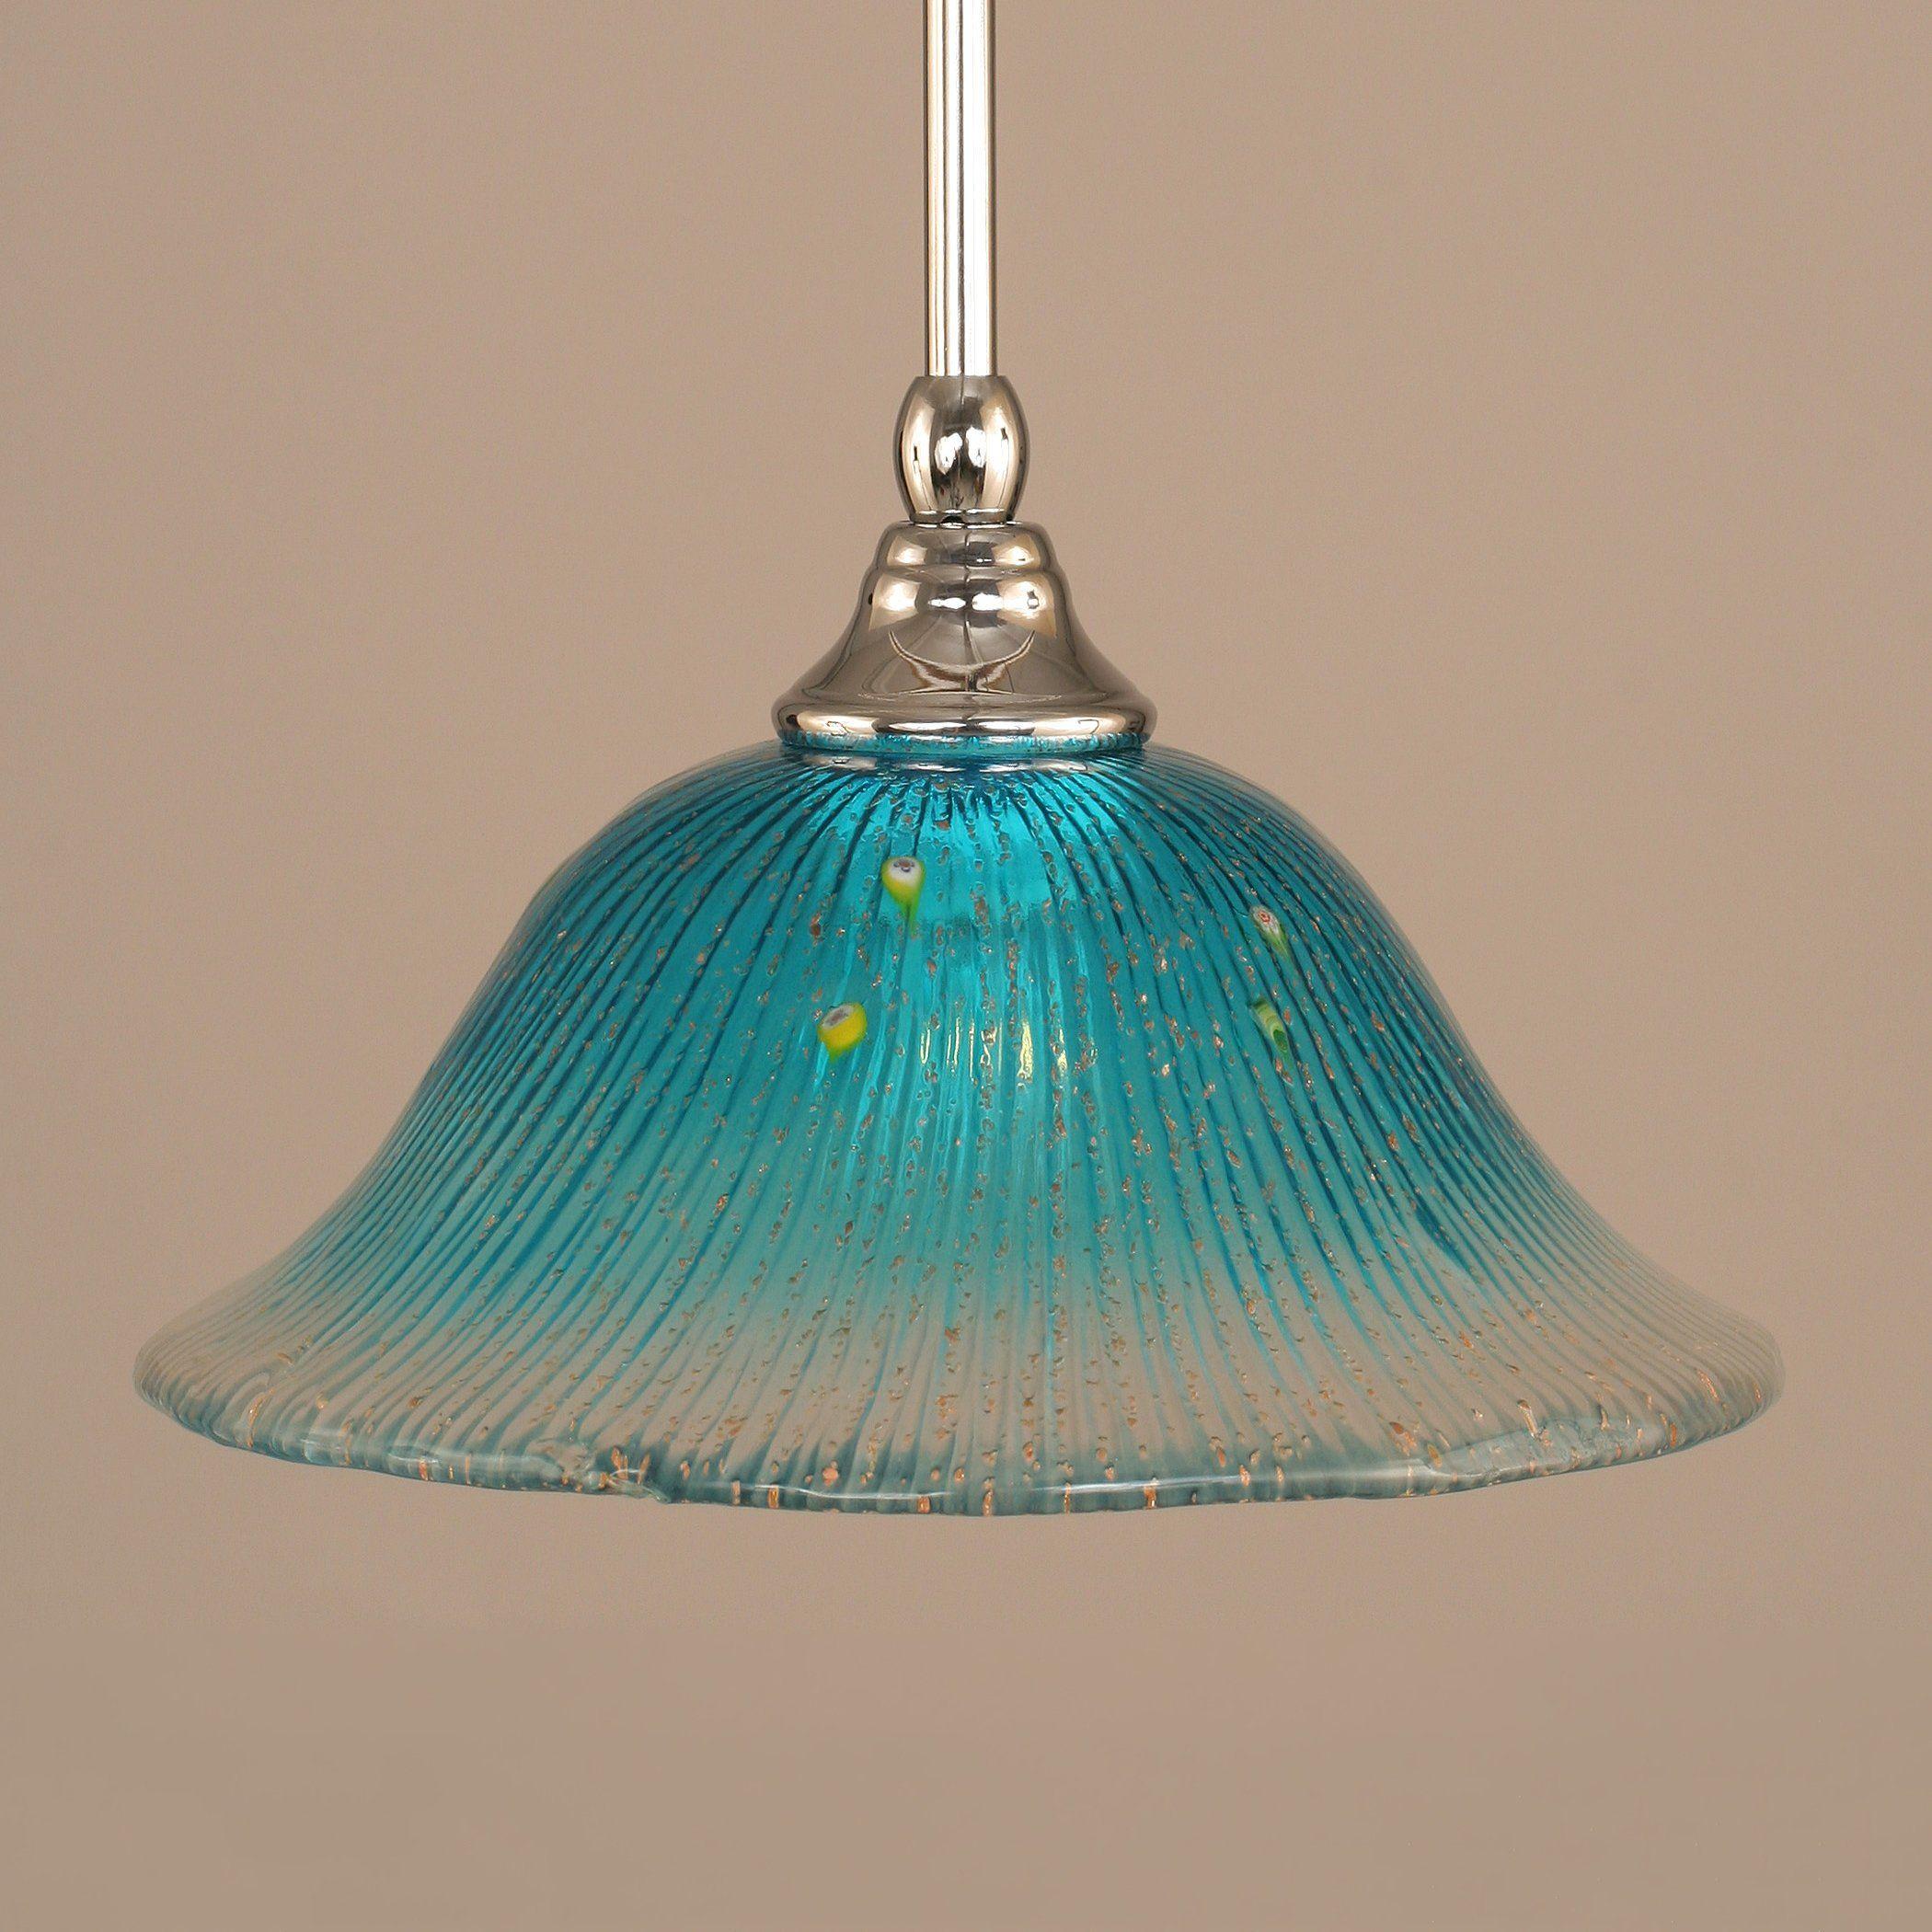 Toltec Lighting 23 438 Stem Mini Pendant with Teal Crystal Glass ...